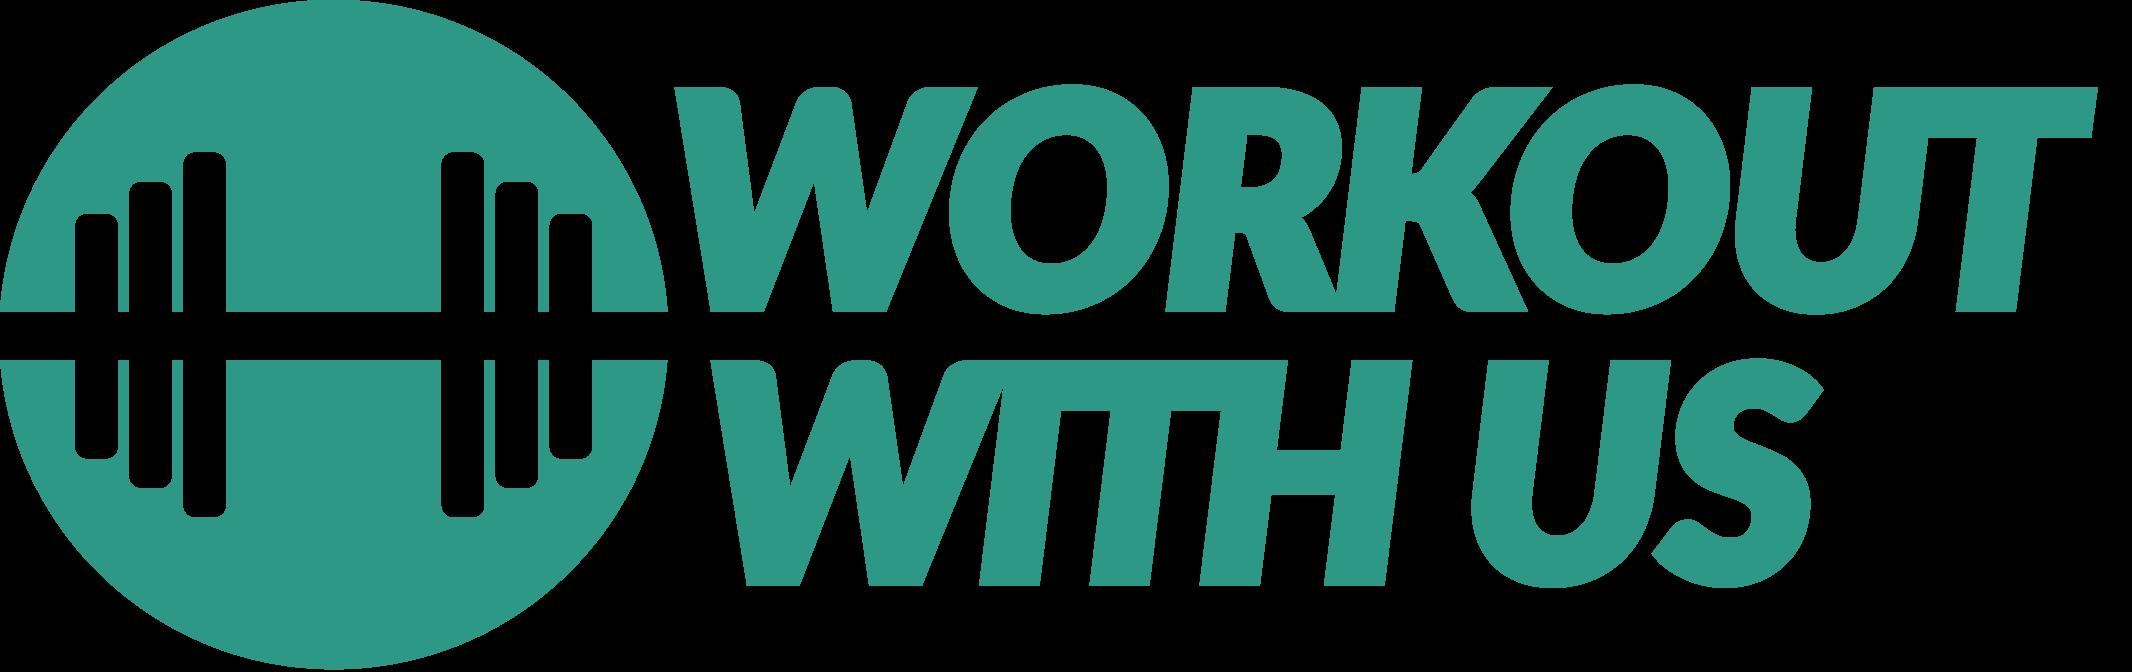 WWU logo green.png